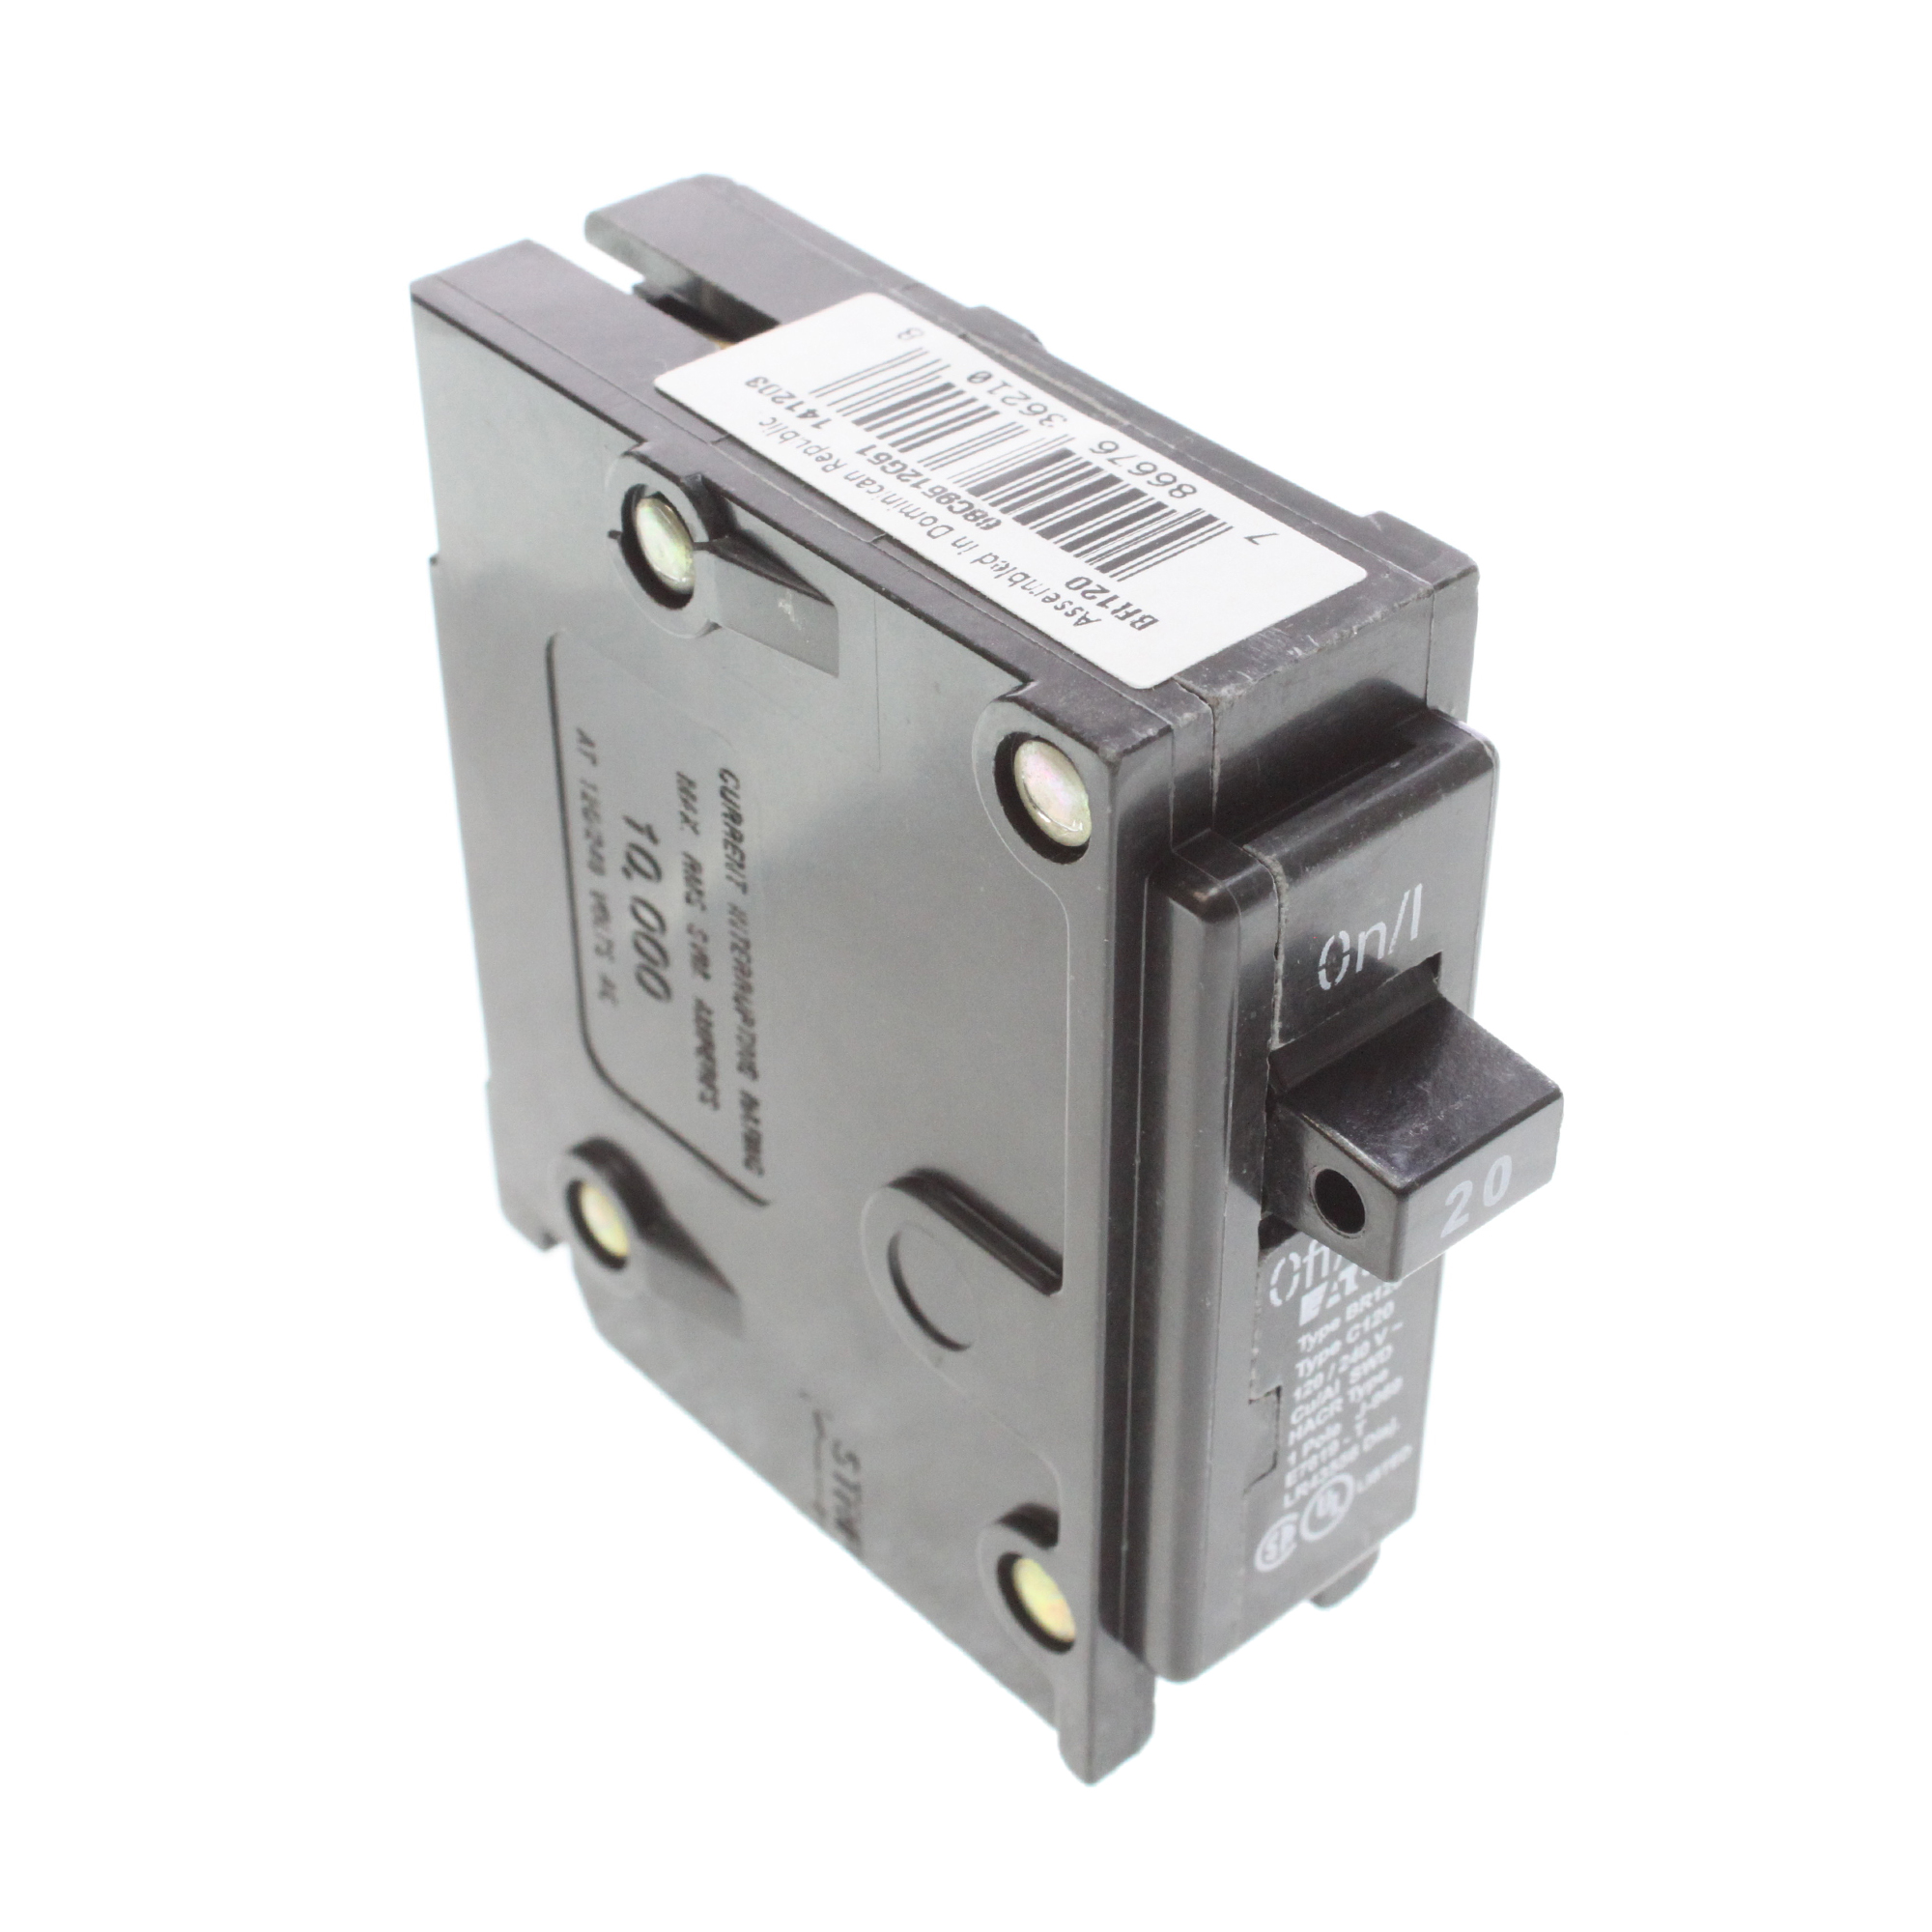 CUTLER HAMMER EATON Br120 Plug-On Circuit Breaker, Br, 20-Amp, 1 ...